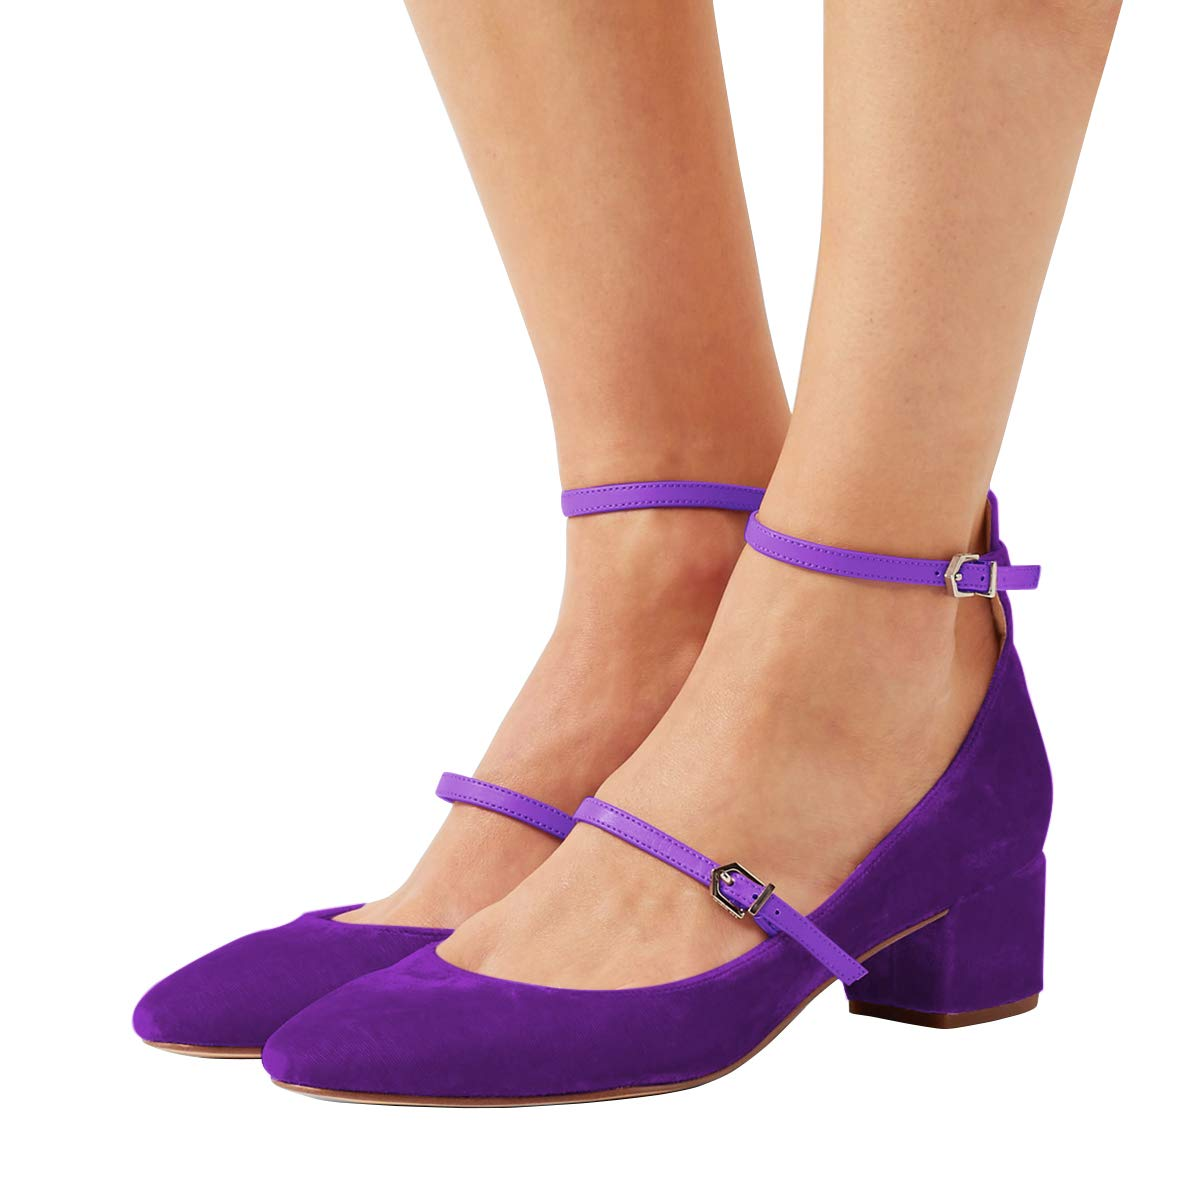 XYD Womens Retro Marry Jane Block Heel Pumps Velvet Ankle Strap Round Toe Dress Shoes Size 9 Purple